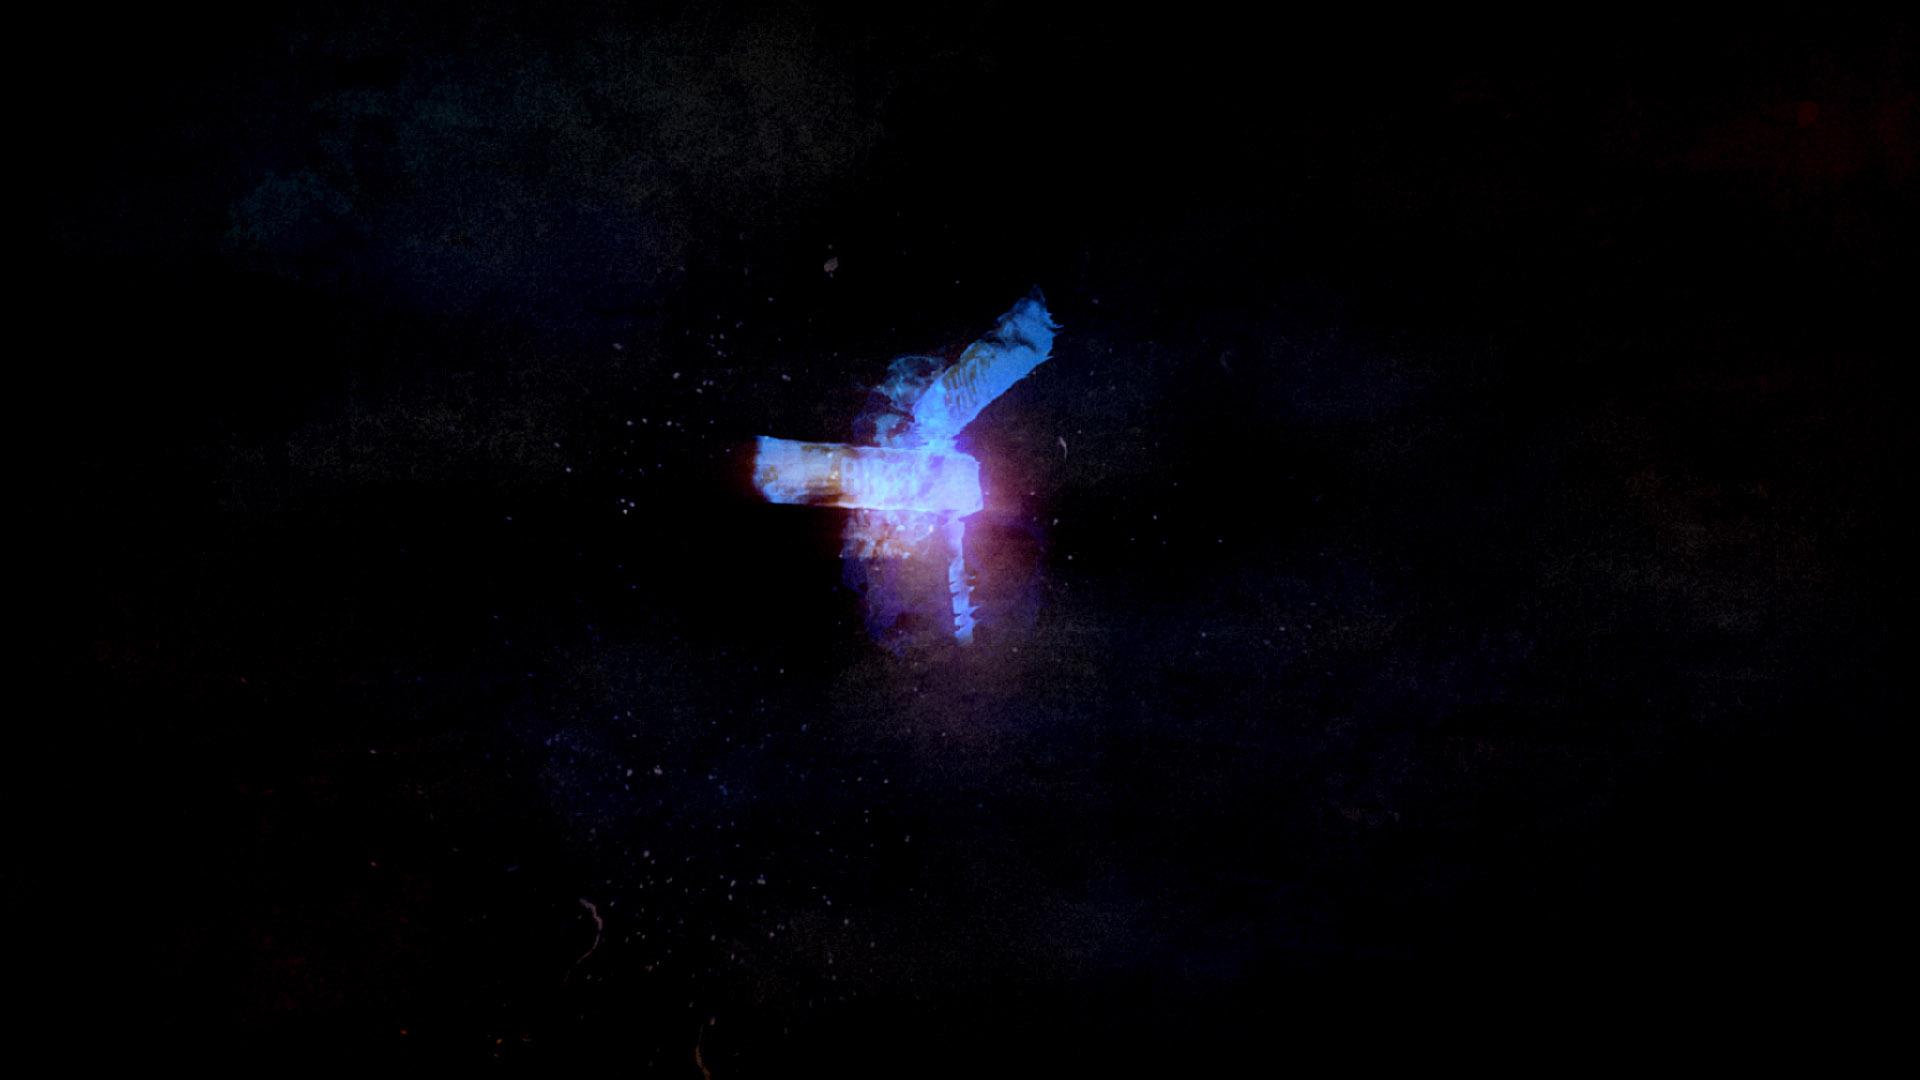 AKA_Teaser_Dreams_Texted_PreLaunch_Stereo_ProResHQ (00176)_web.jpg